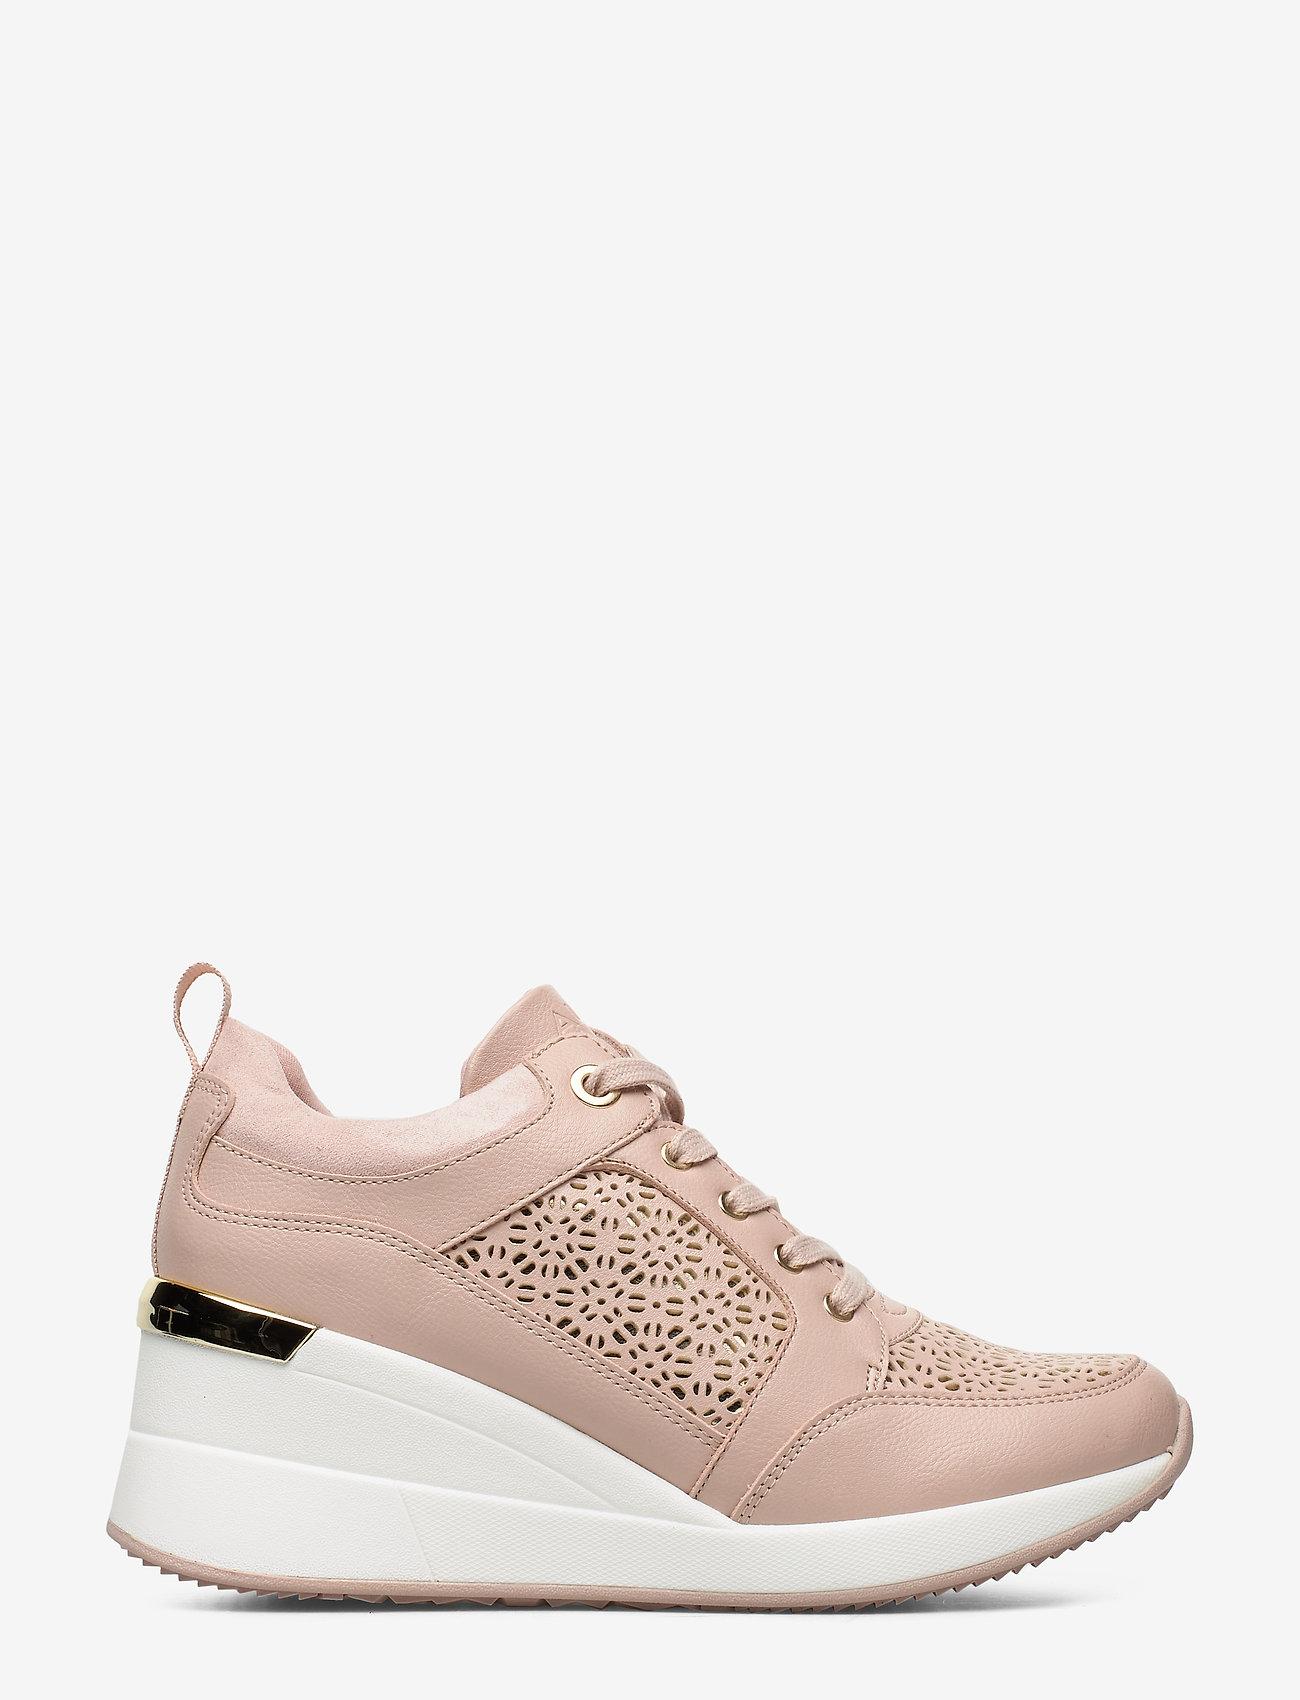 Aldo - COLUBER - chunky sneakers - light pink